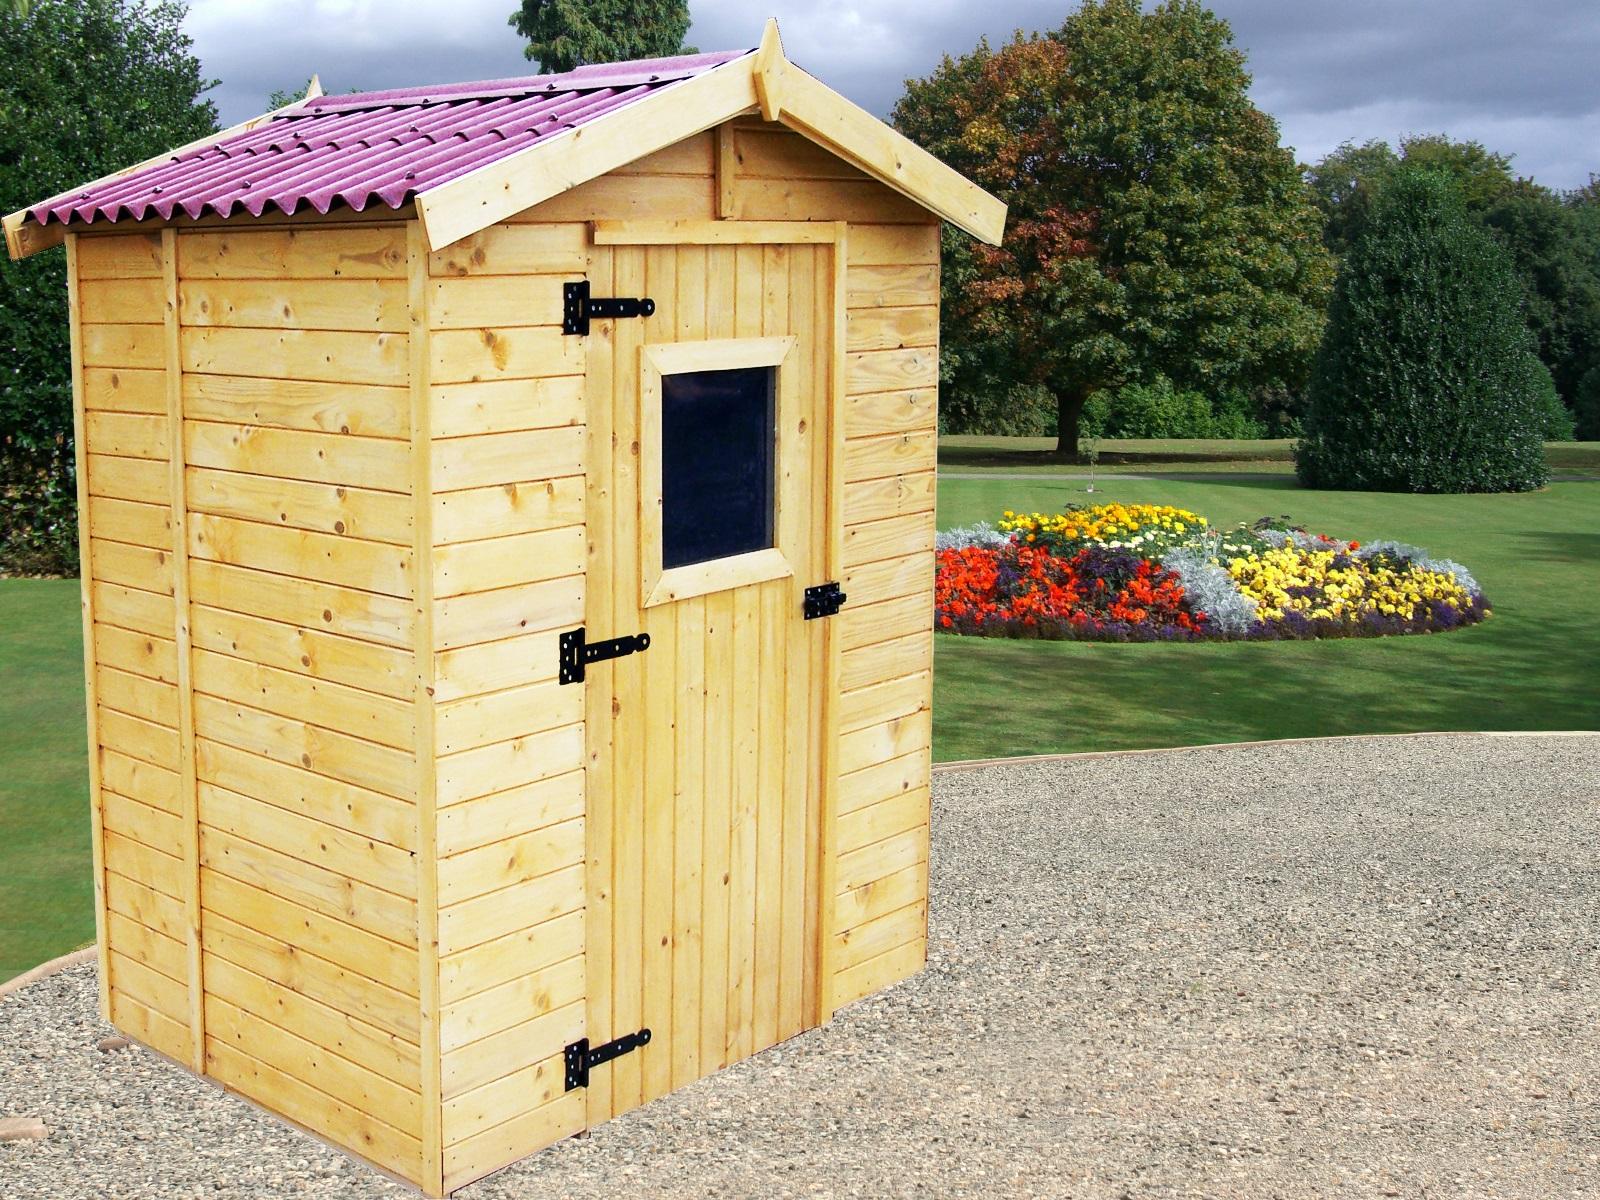 abri de jardin bois eden x m avec plancher bouvara bouvara des prix. Black Bedroom Furniture Sets. Home Design Ideas